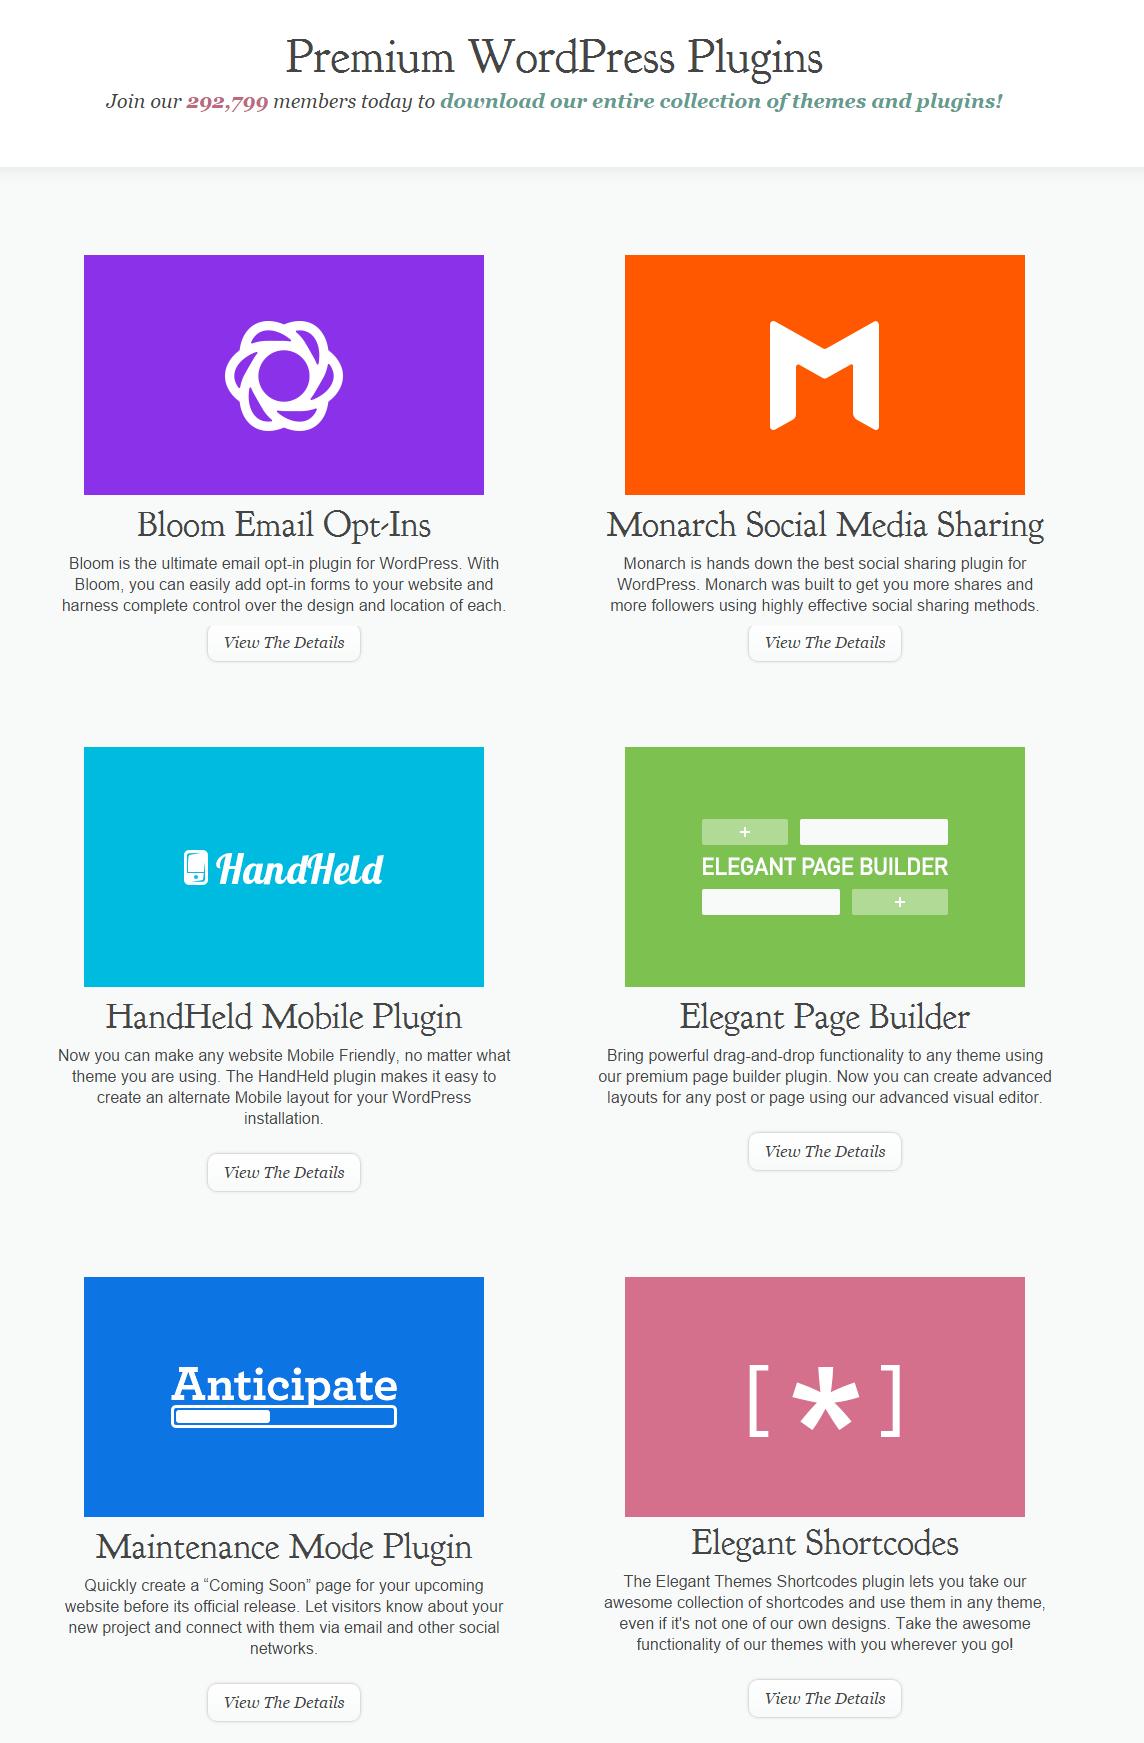 Elegant Themes Premium WordPress Plugins